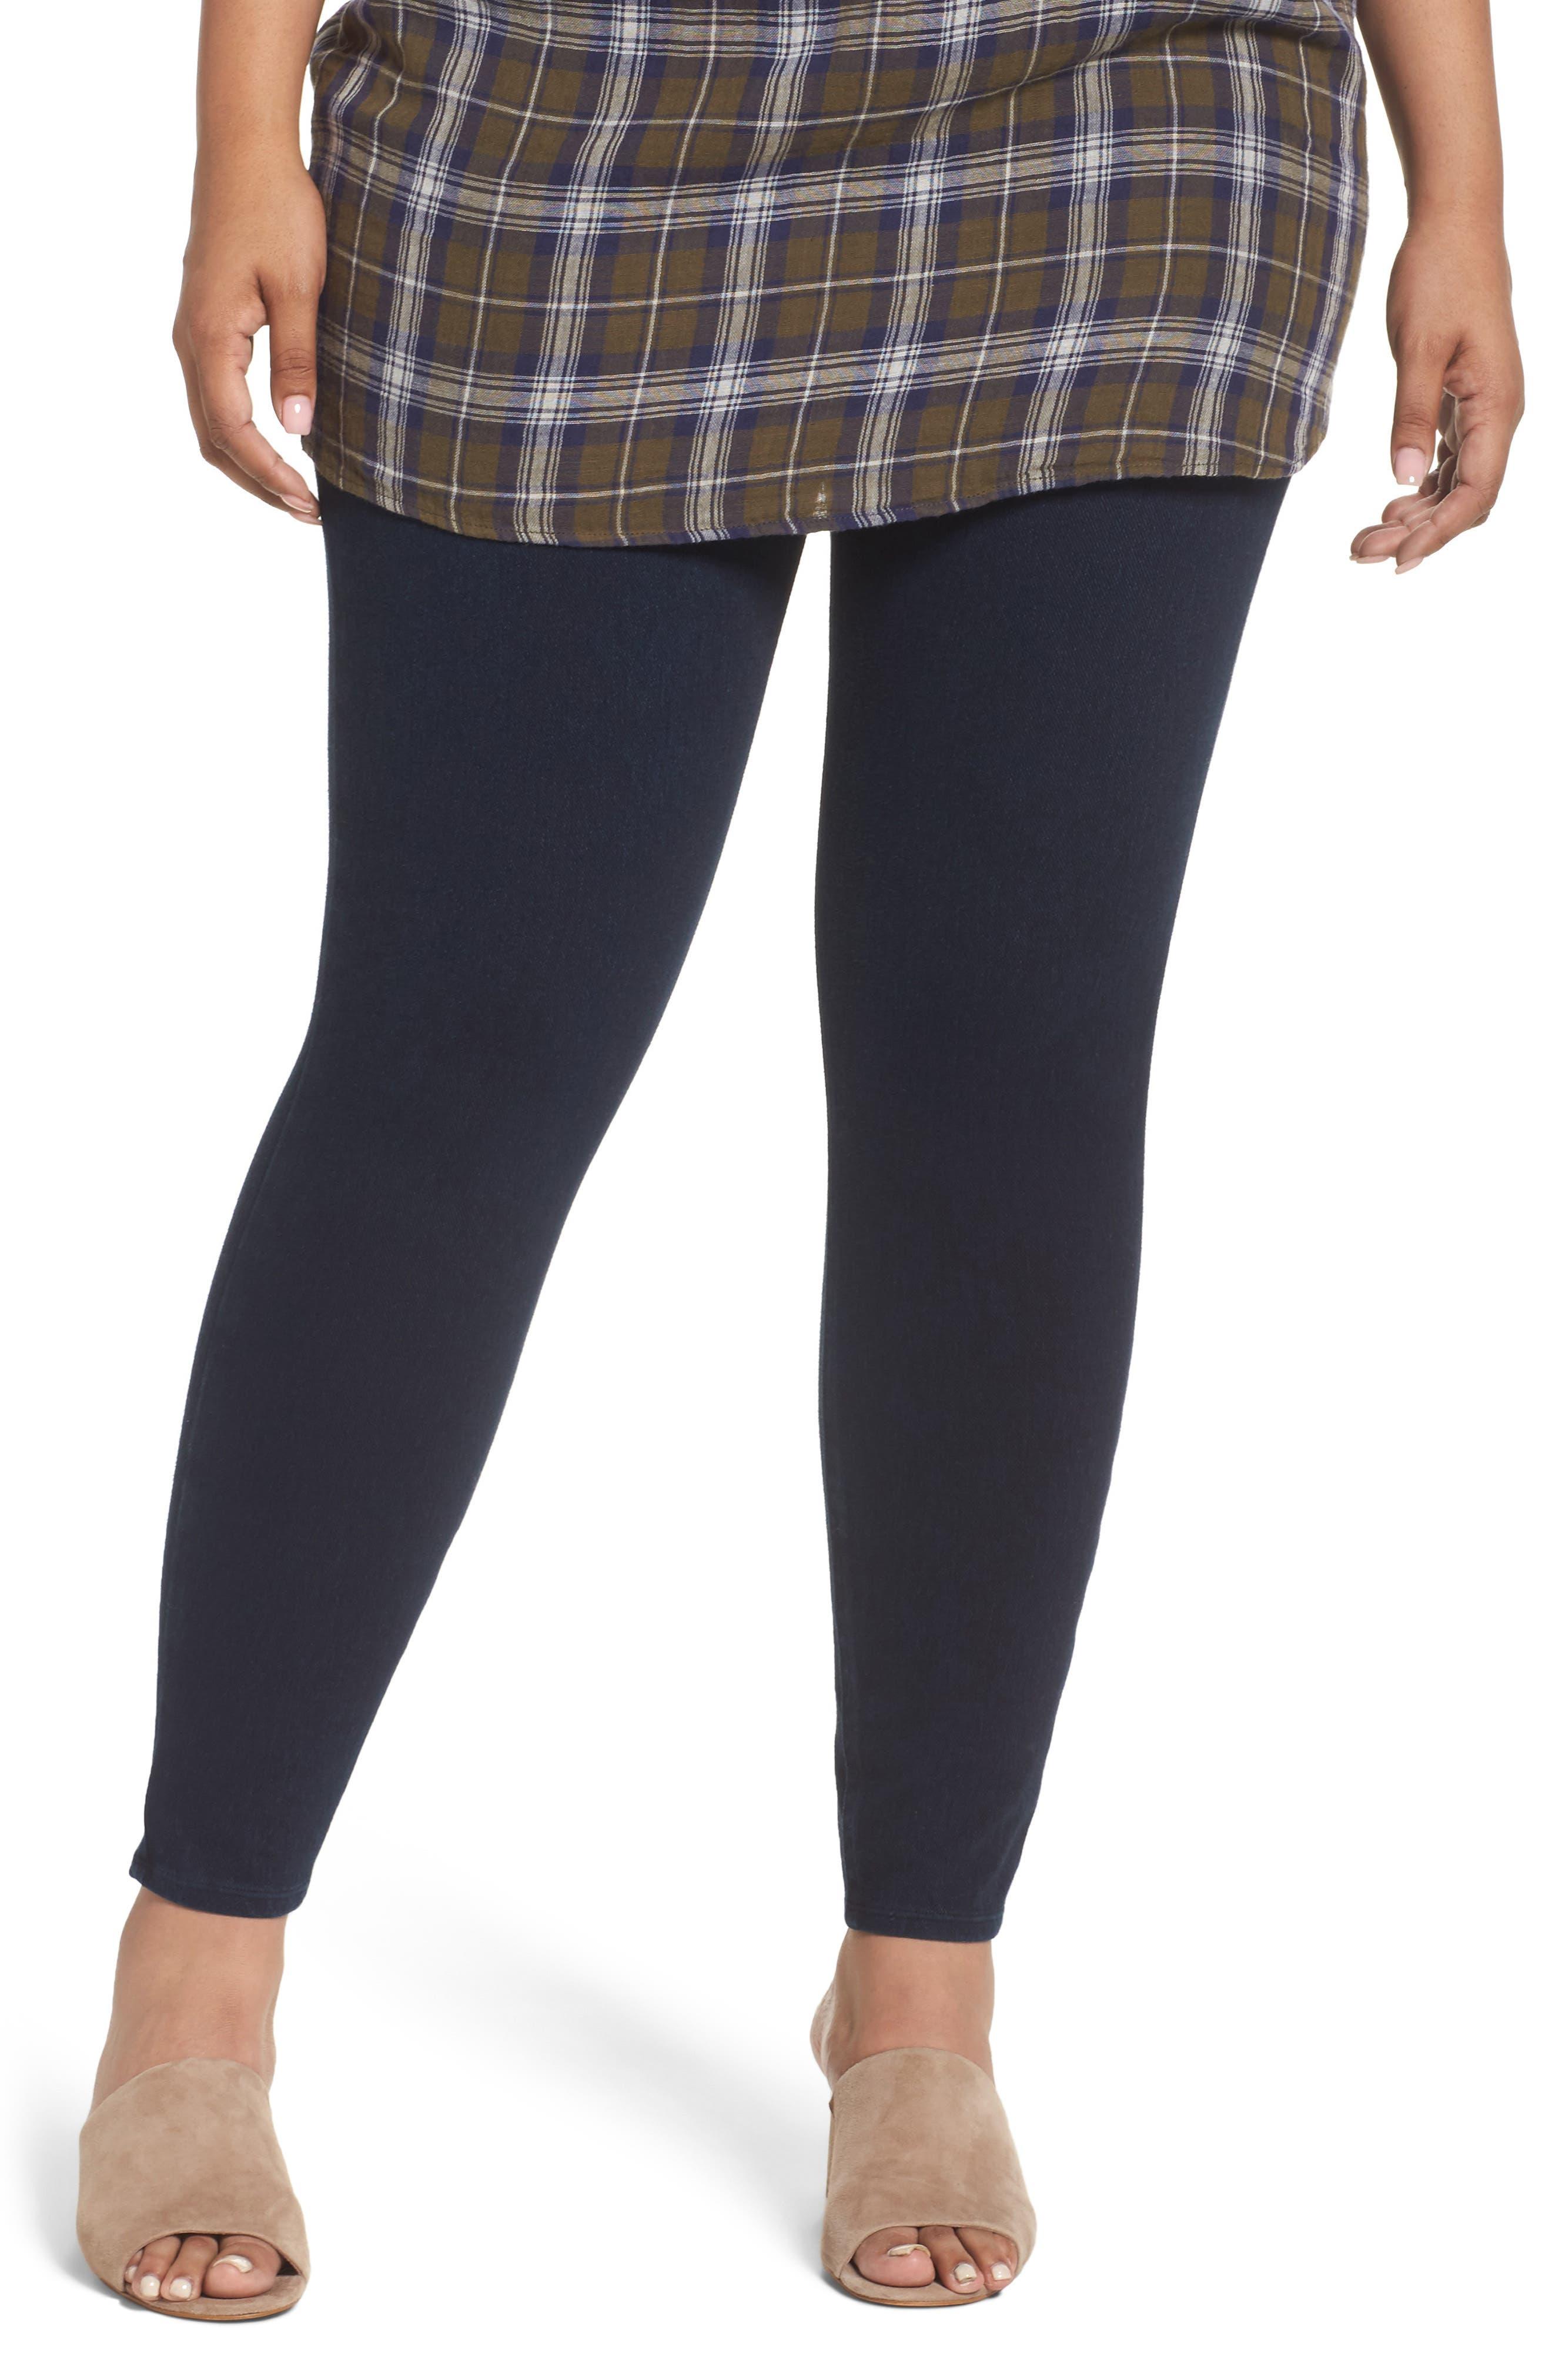 Plus Women's Spanx Jean-Ish Leggings